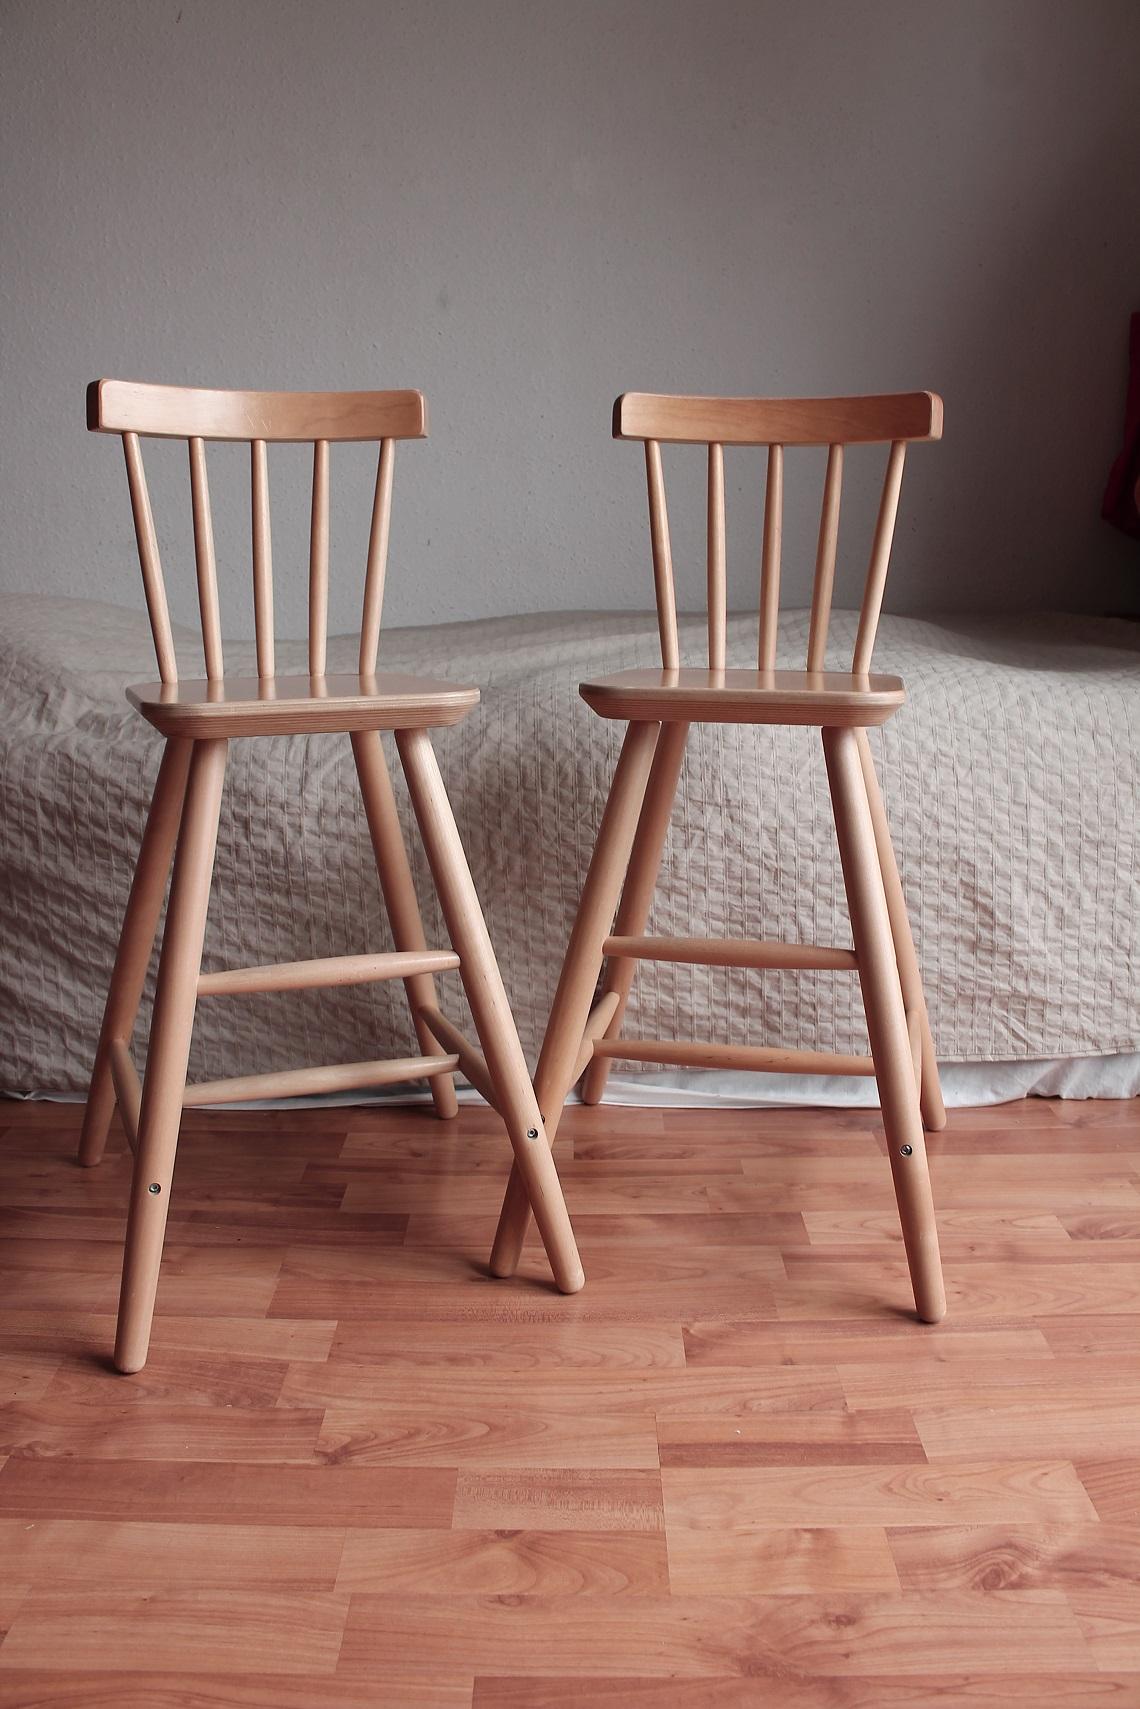 IKEA-høje-stole-til-218466955